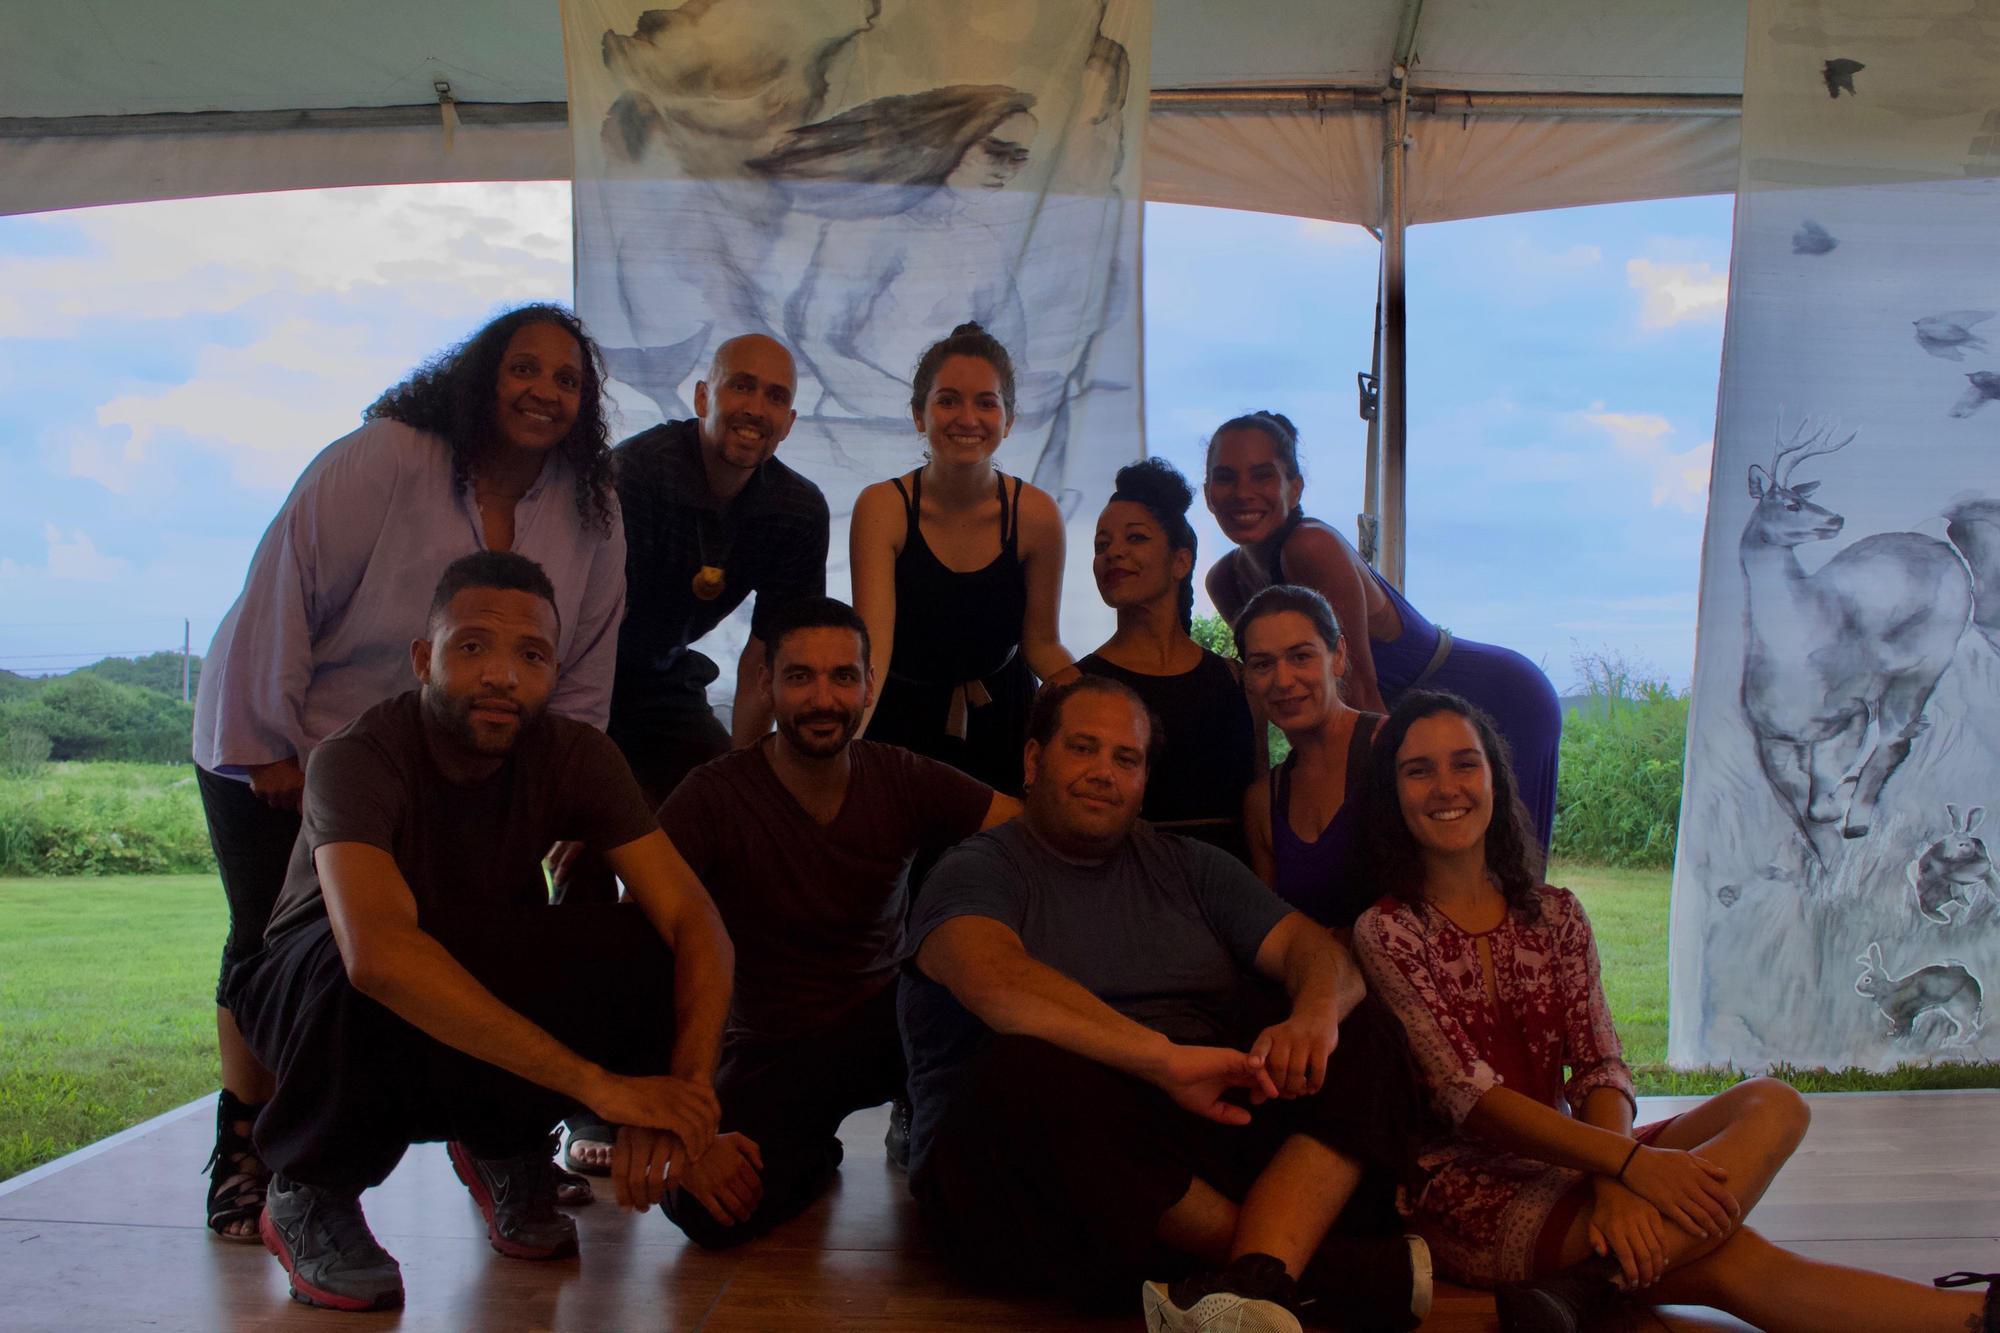 Members of Danza Orgánica and the Aquinnah Wampanoag Tribe